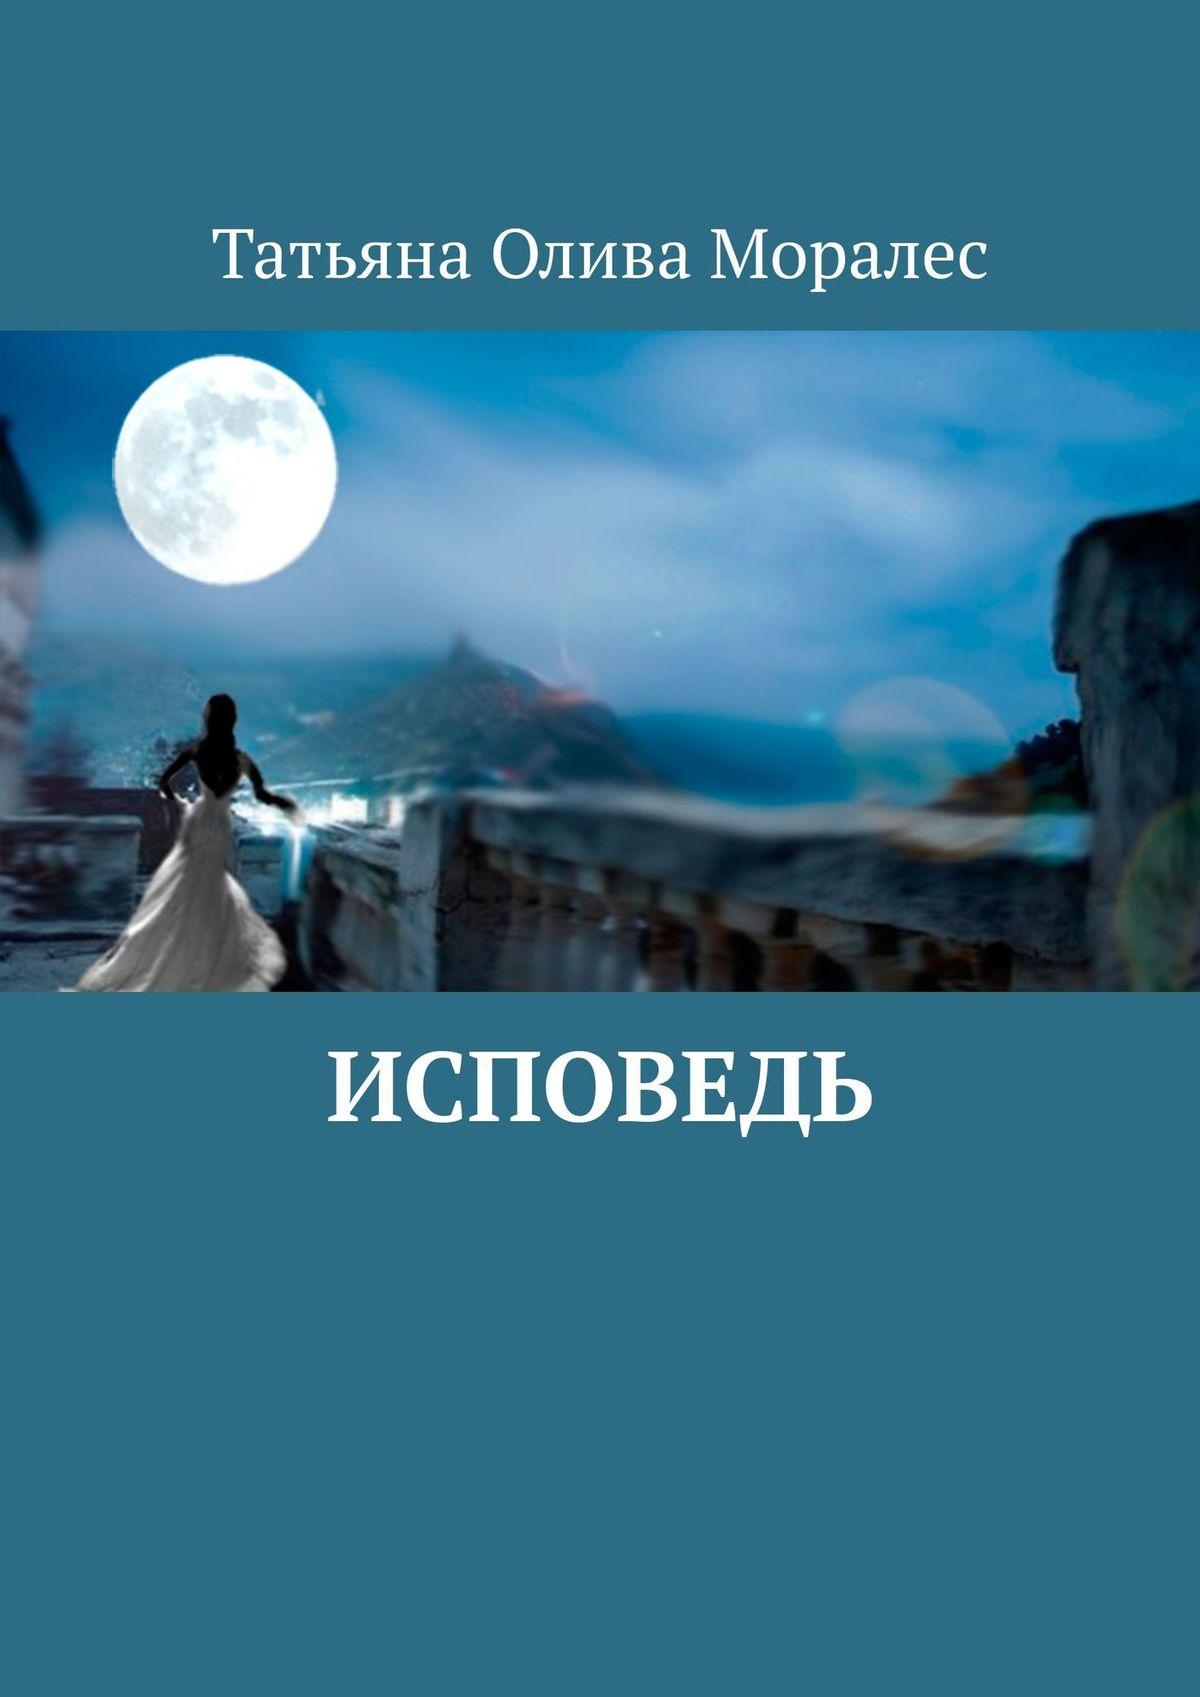 Татьяна Олива Моралес Исповедь цена в Москве и Питере